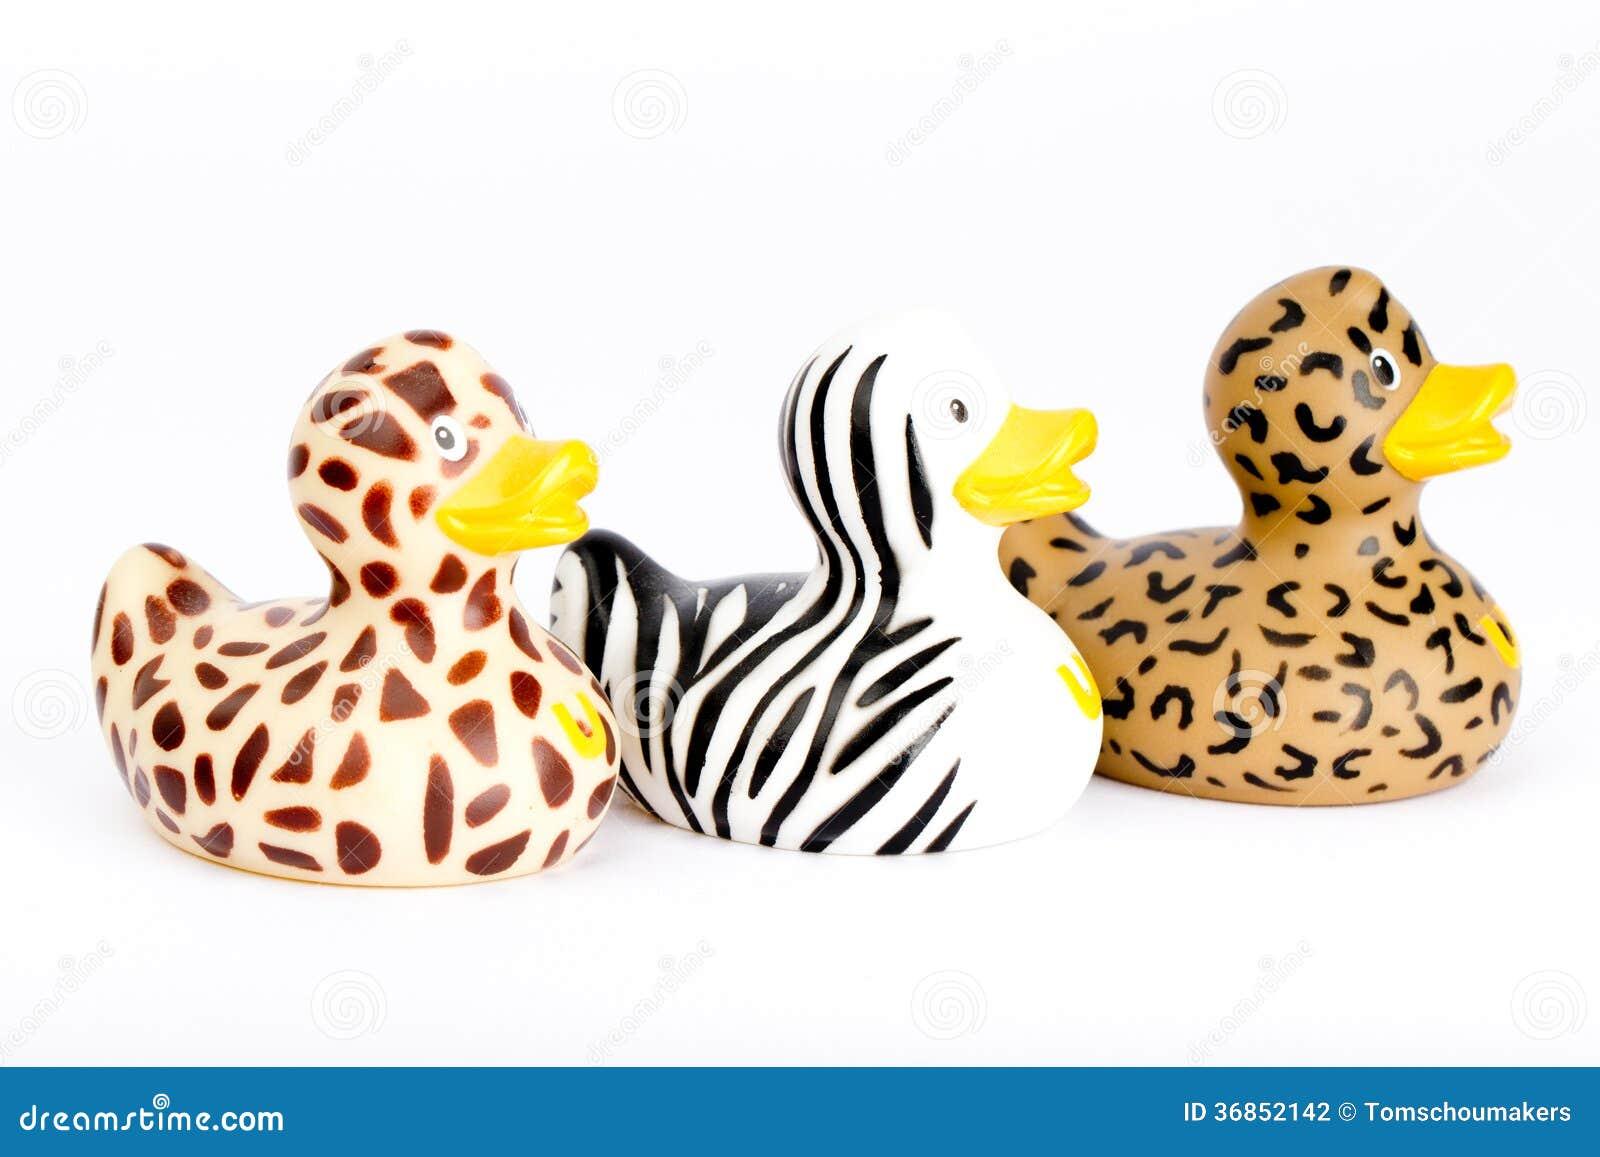 Three plastic wild ducks